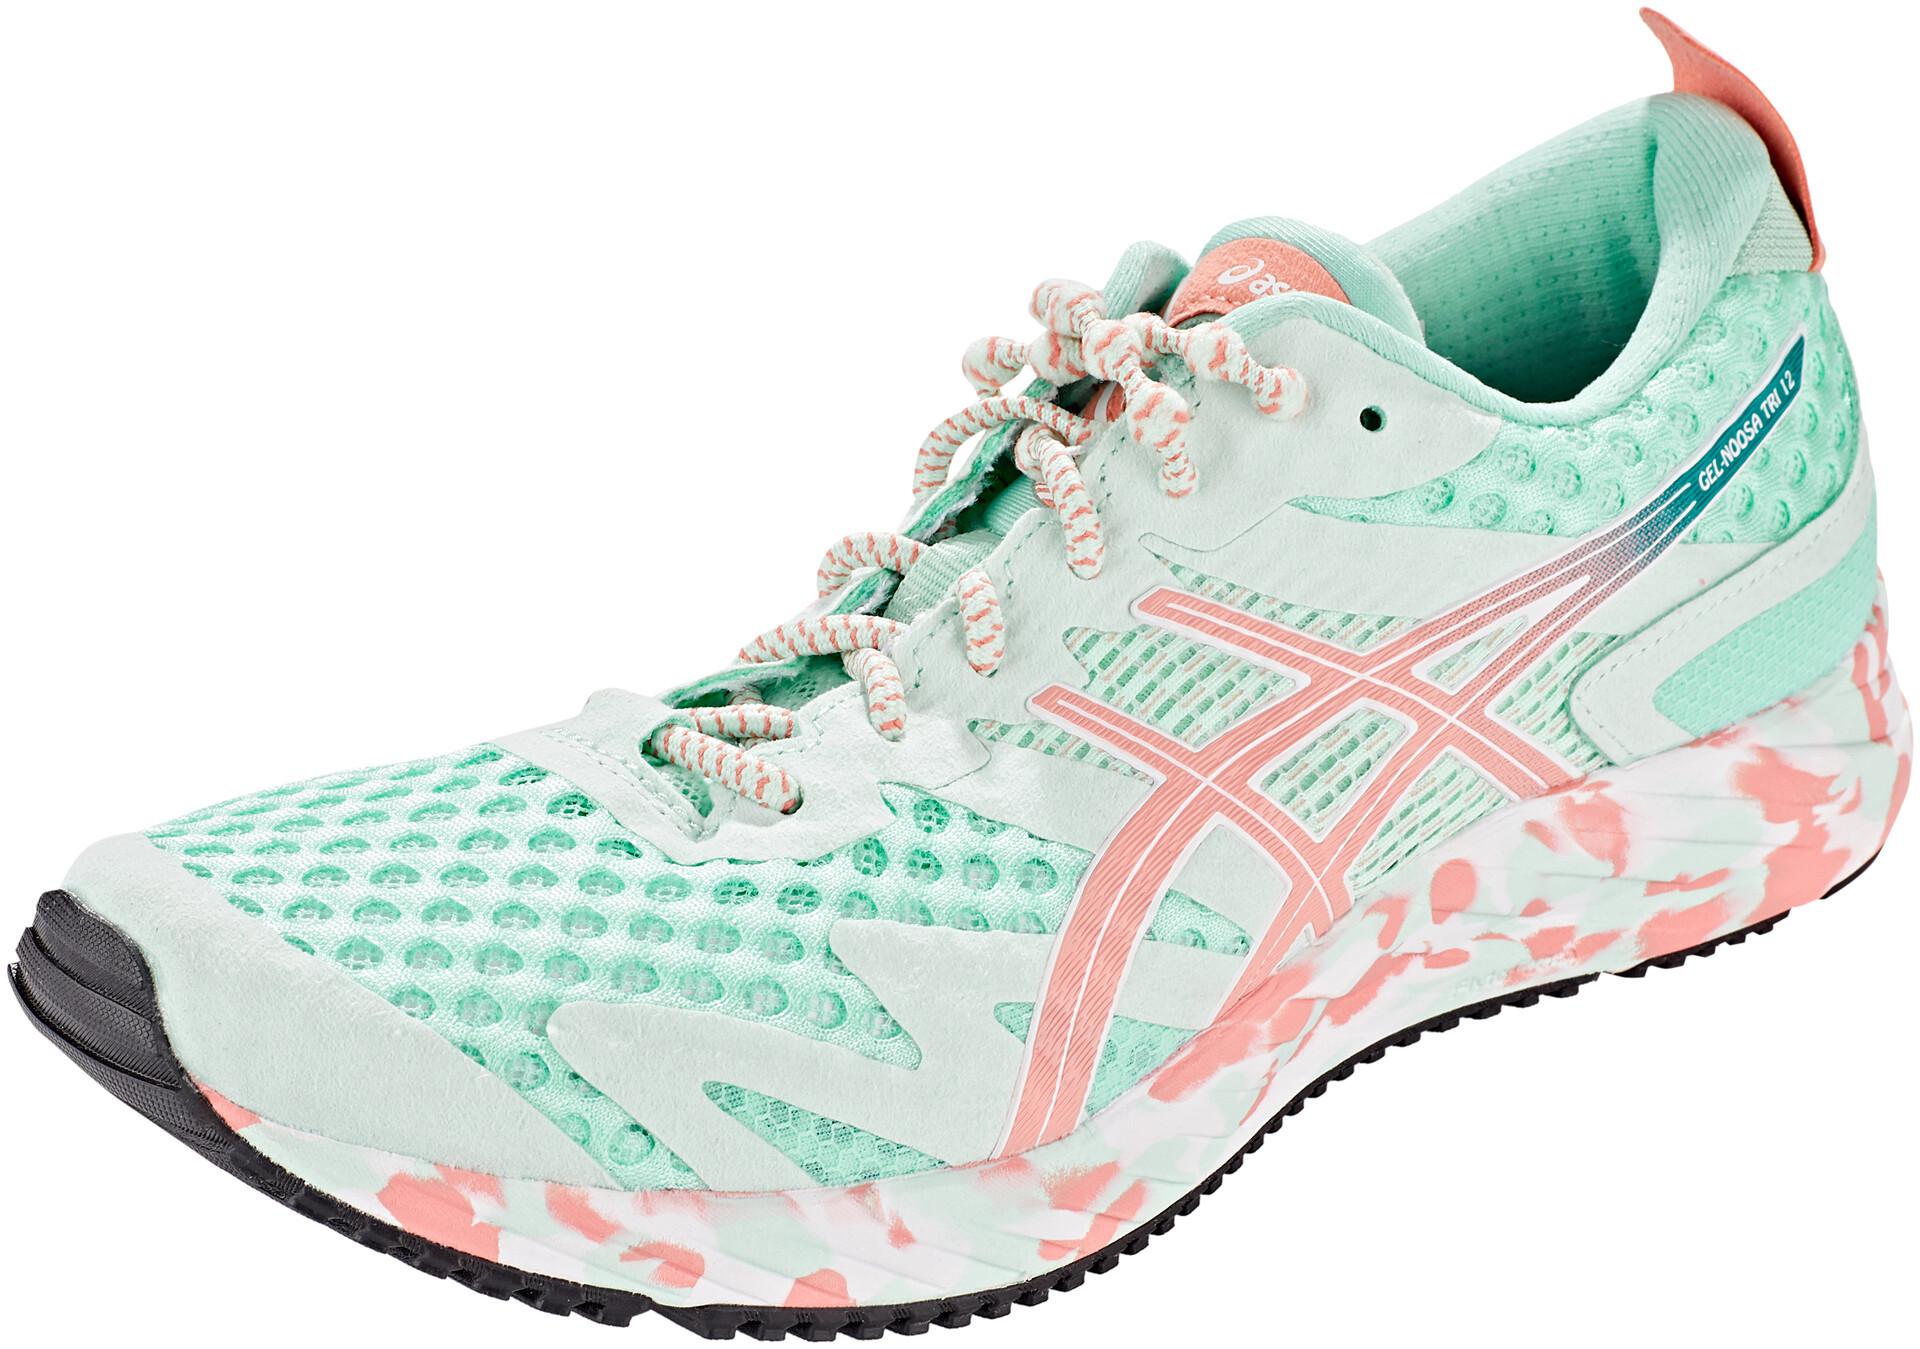 Asics Damen Gel-Noosa Tri 12 Turnschuhe Laufschuhe Sneaker Schuhe Blau Grün